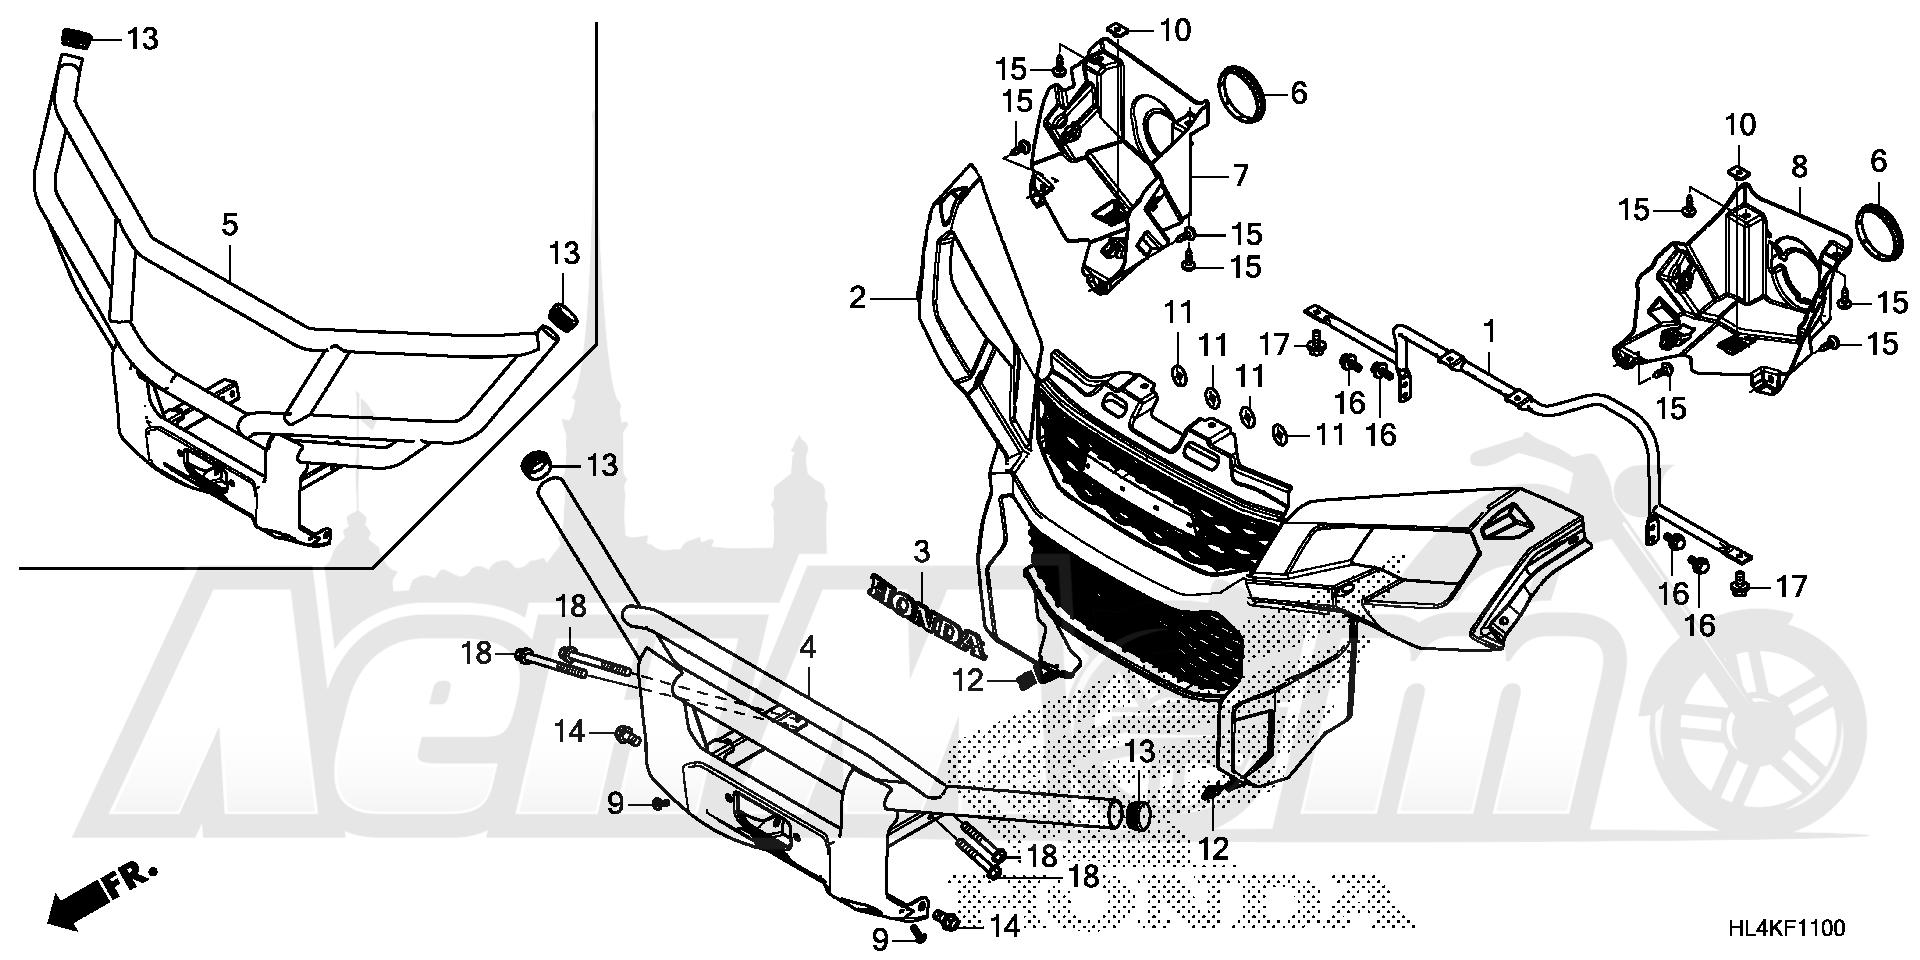 Запчасти для Квадроцикла Honda 2019 SXS1000M3P Раздел: FRONT GRILLE AND FRONT BUMPER | перед GRILLE и перед бампер